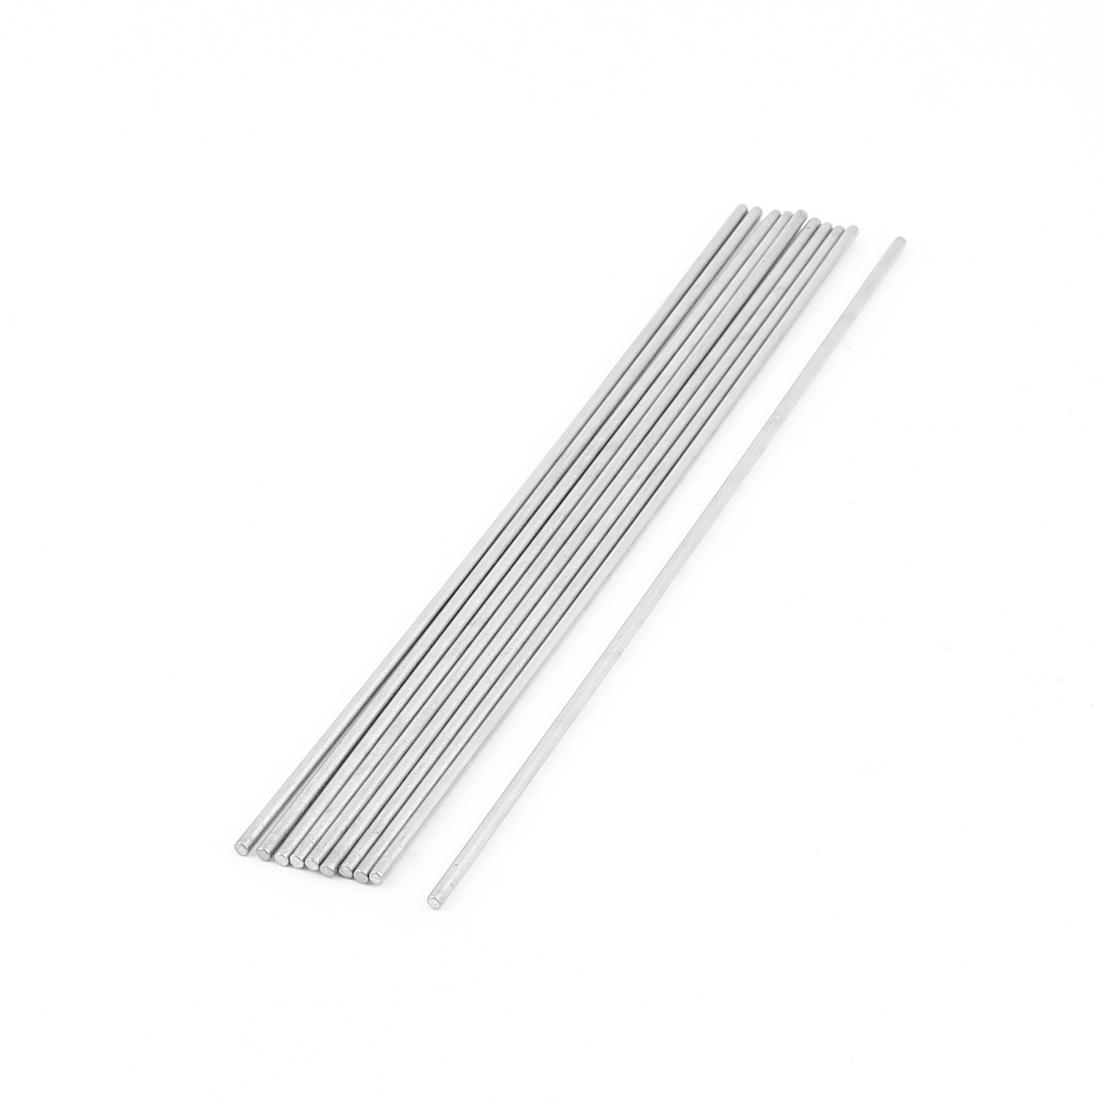 10 Pcs 2mm x 150mm DIY RC Car Toy Model Straight Metal Round Shaft Rod Bars